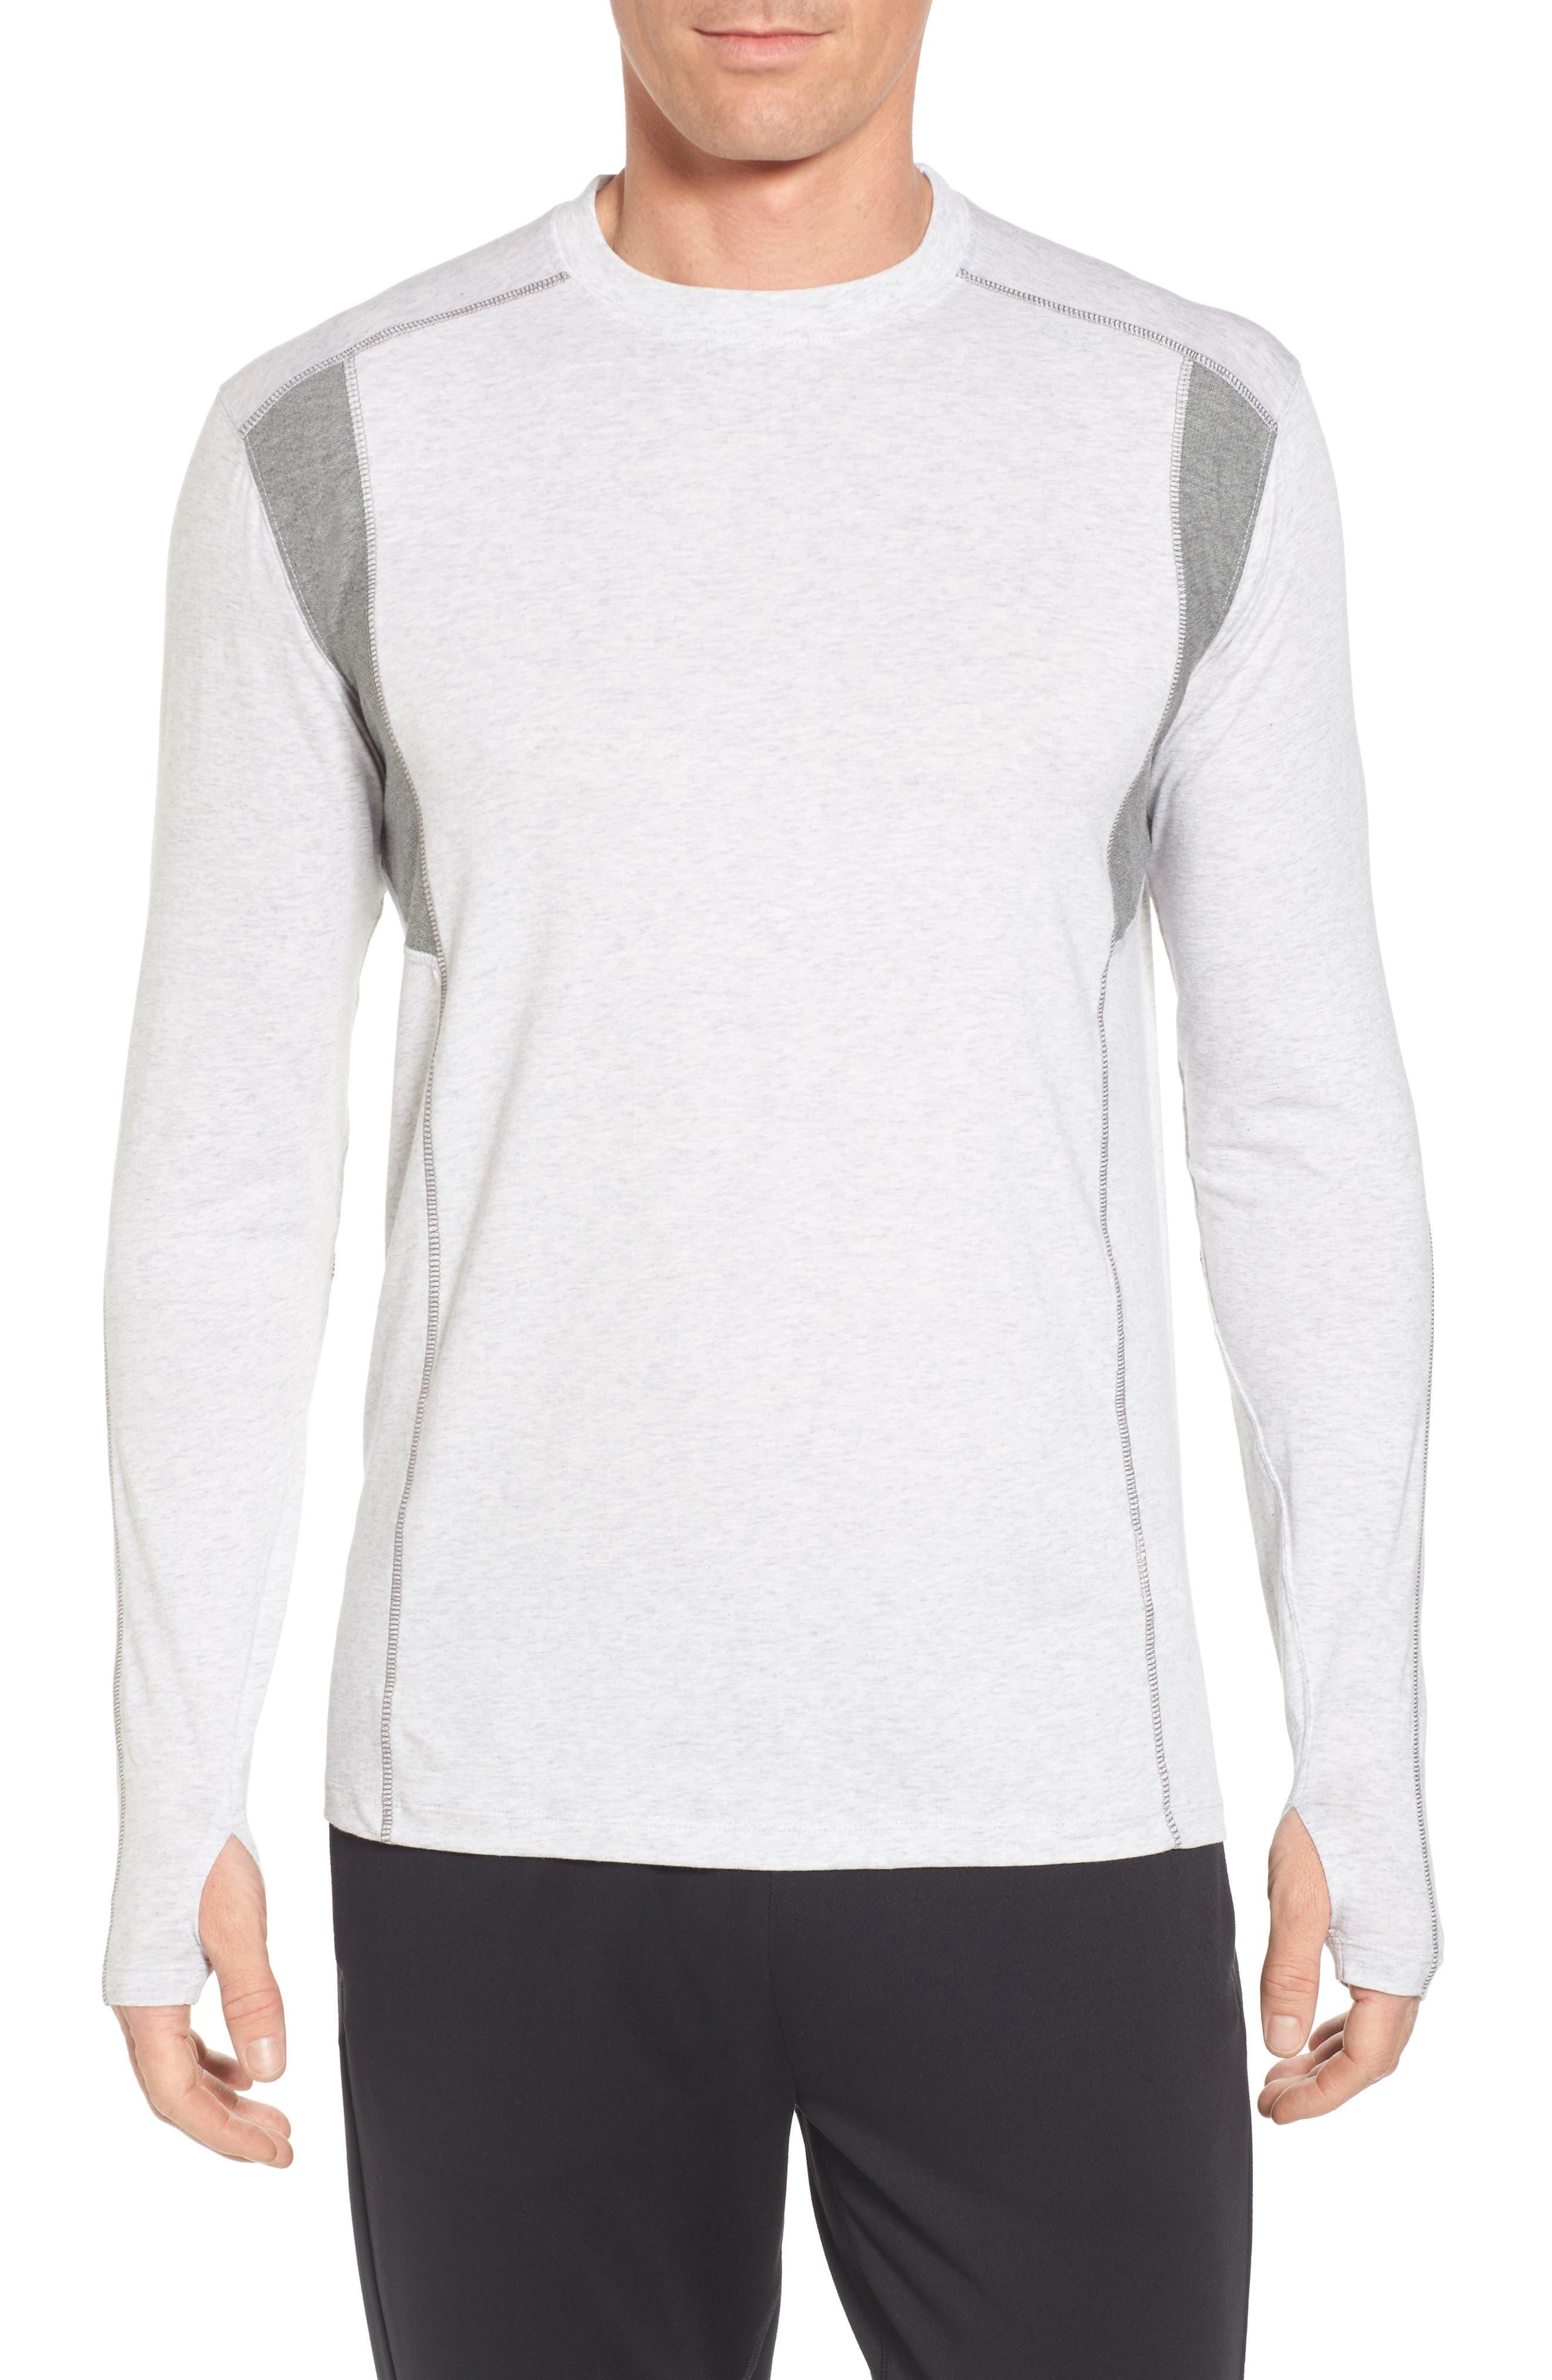 Main Image - tasc Performance Charge Sweatshirt